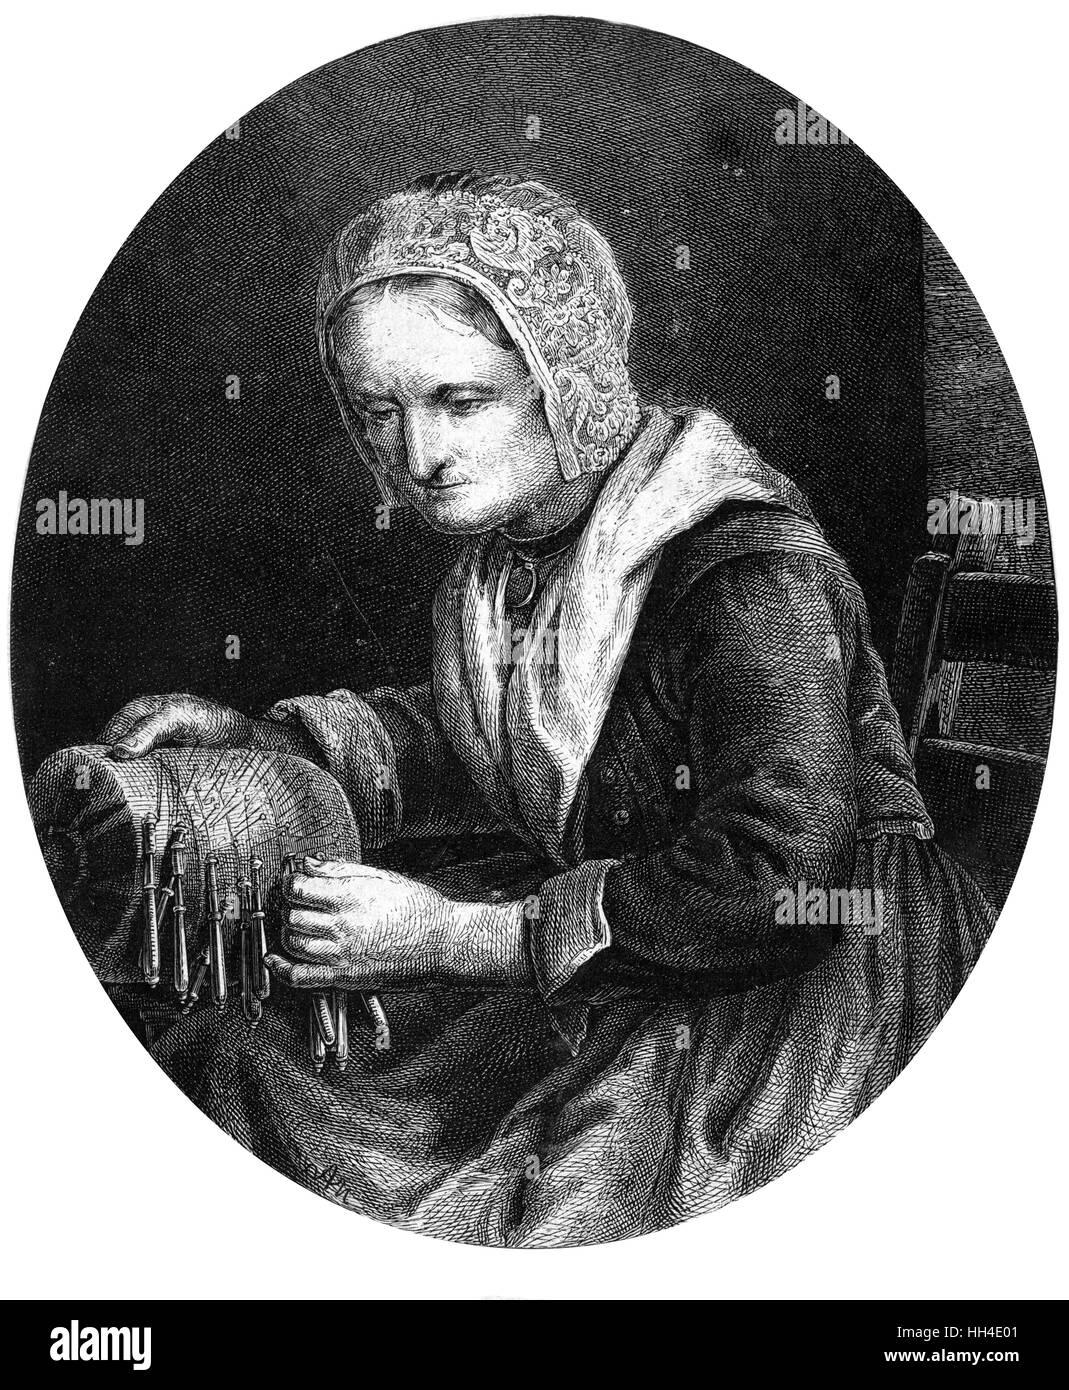 BARBARA UTTMANN  Lacemaker - Stock Image